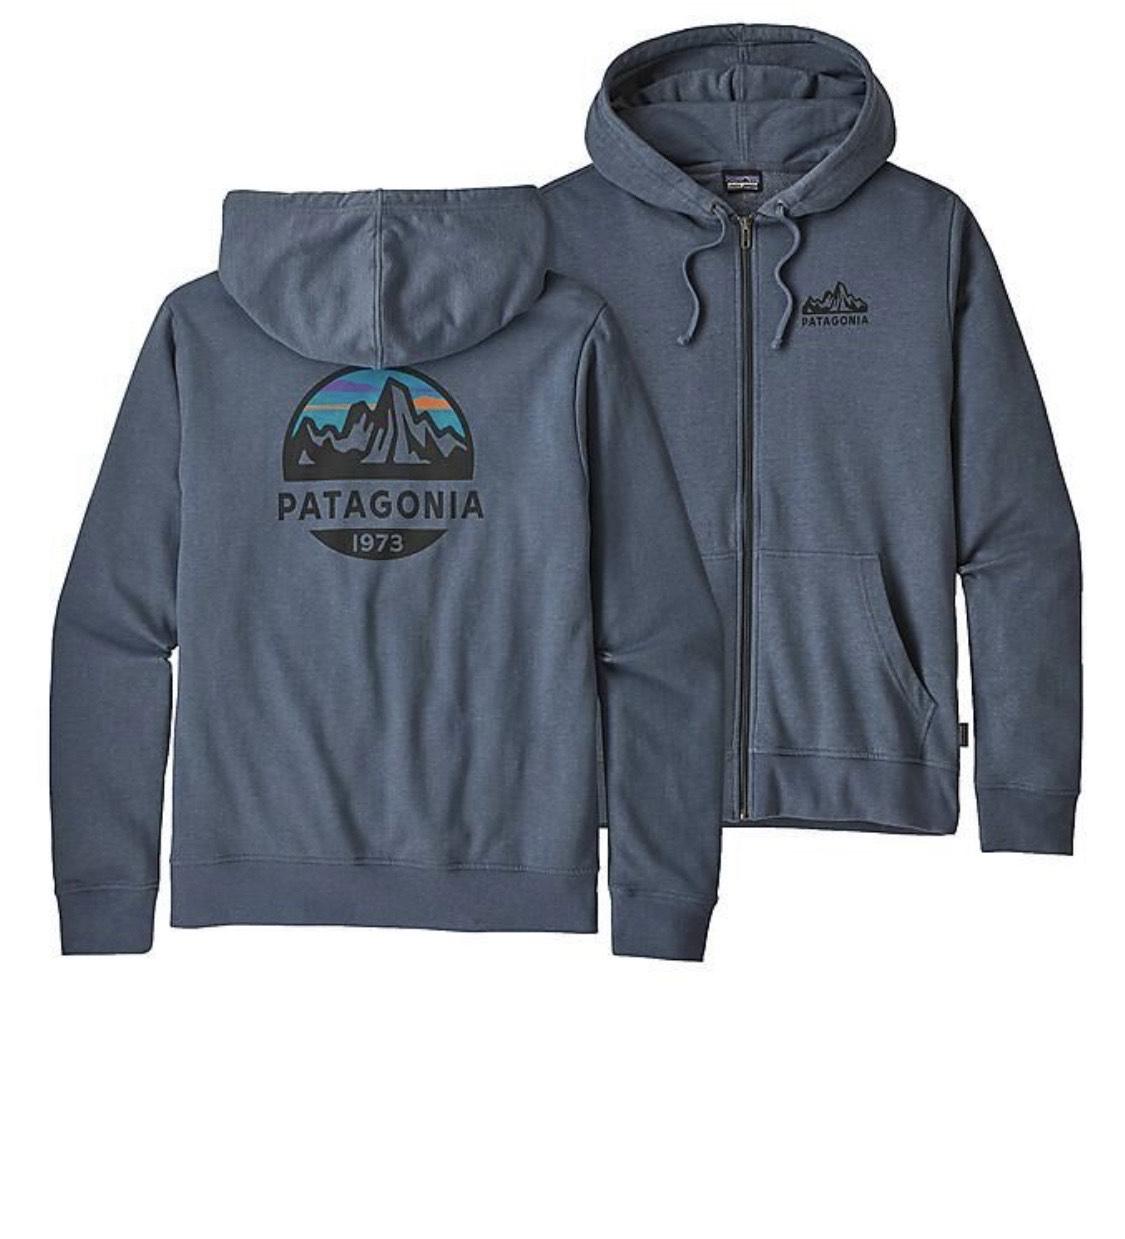 Veste à capuche homme Patagonia Fitz Roy Scope Lightweight M - Bleue (Taille XL)